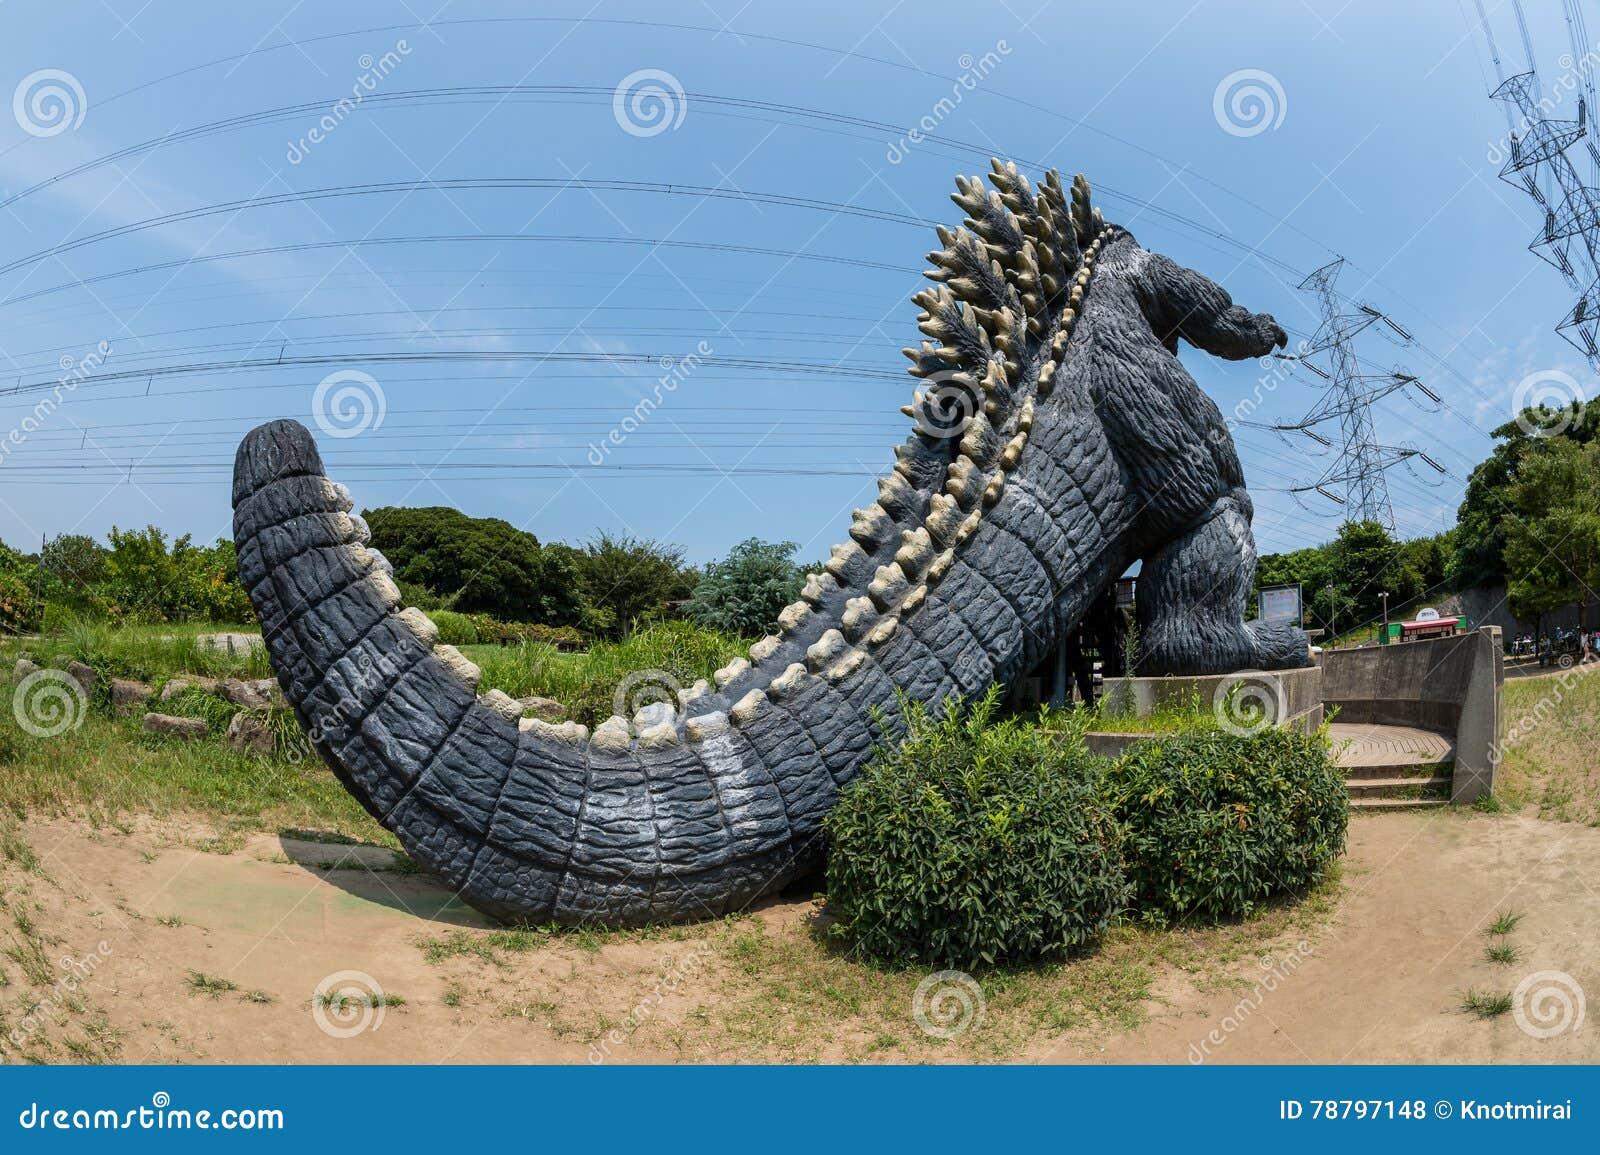 YOKOSUKA, Japan - AUG 14, 2016: A rear view of famous monster Godzilla in Yokosuka, Kanagawa, Japan